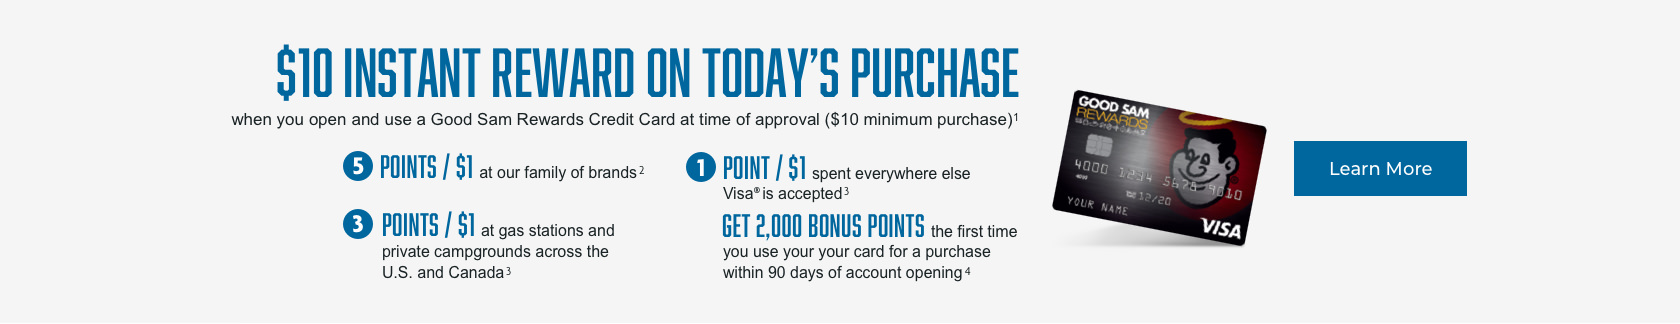 Good Sam Rewards Credit Card